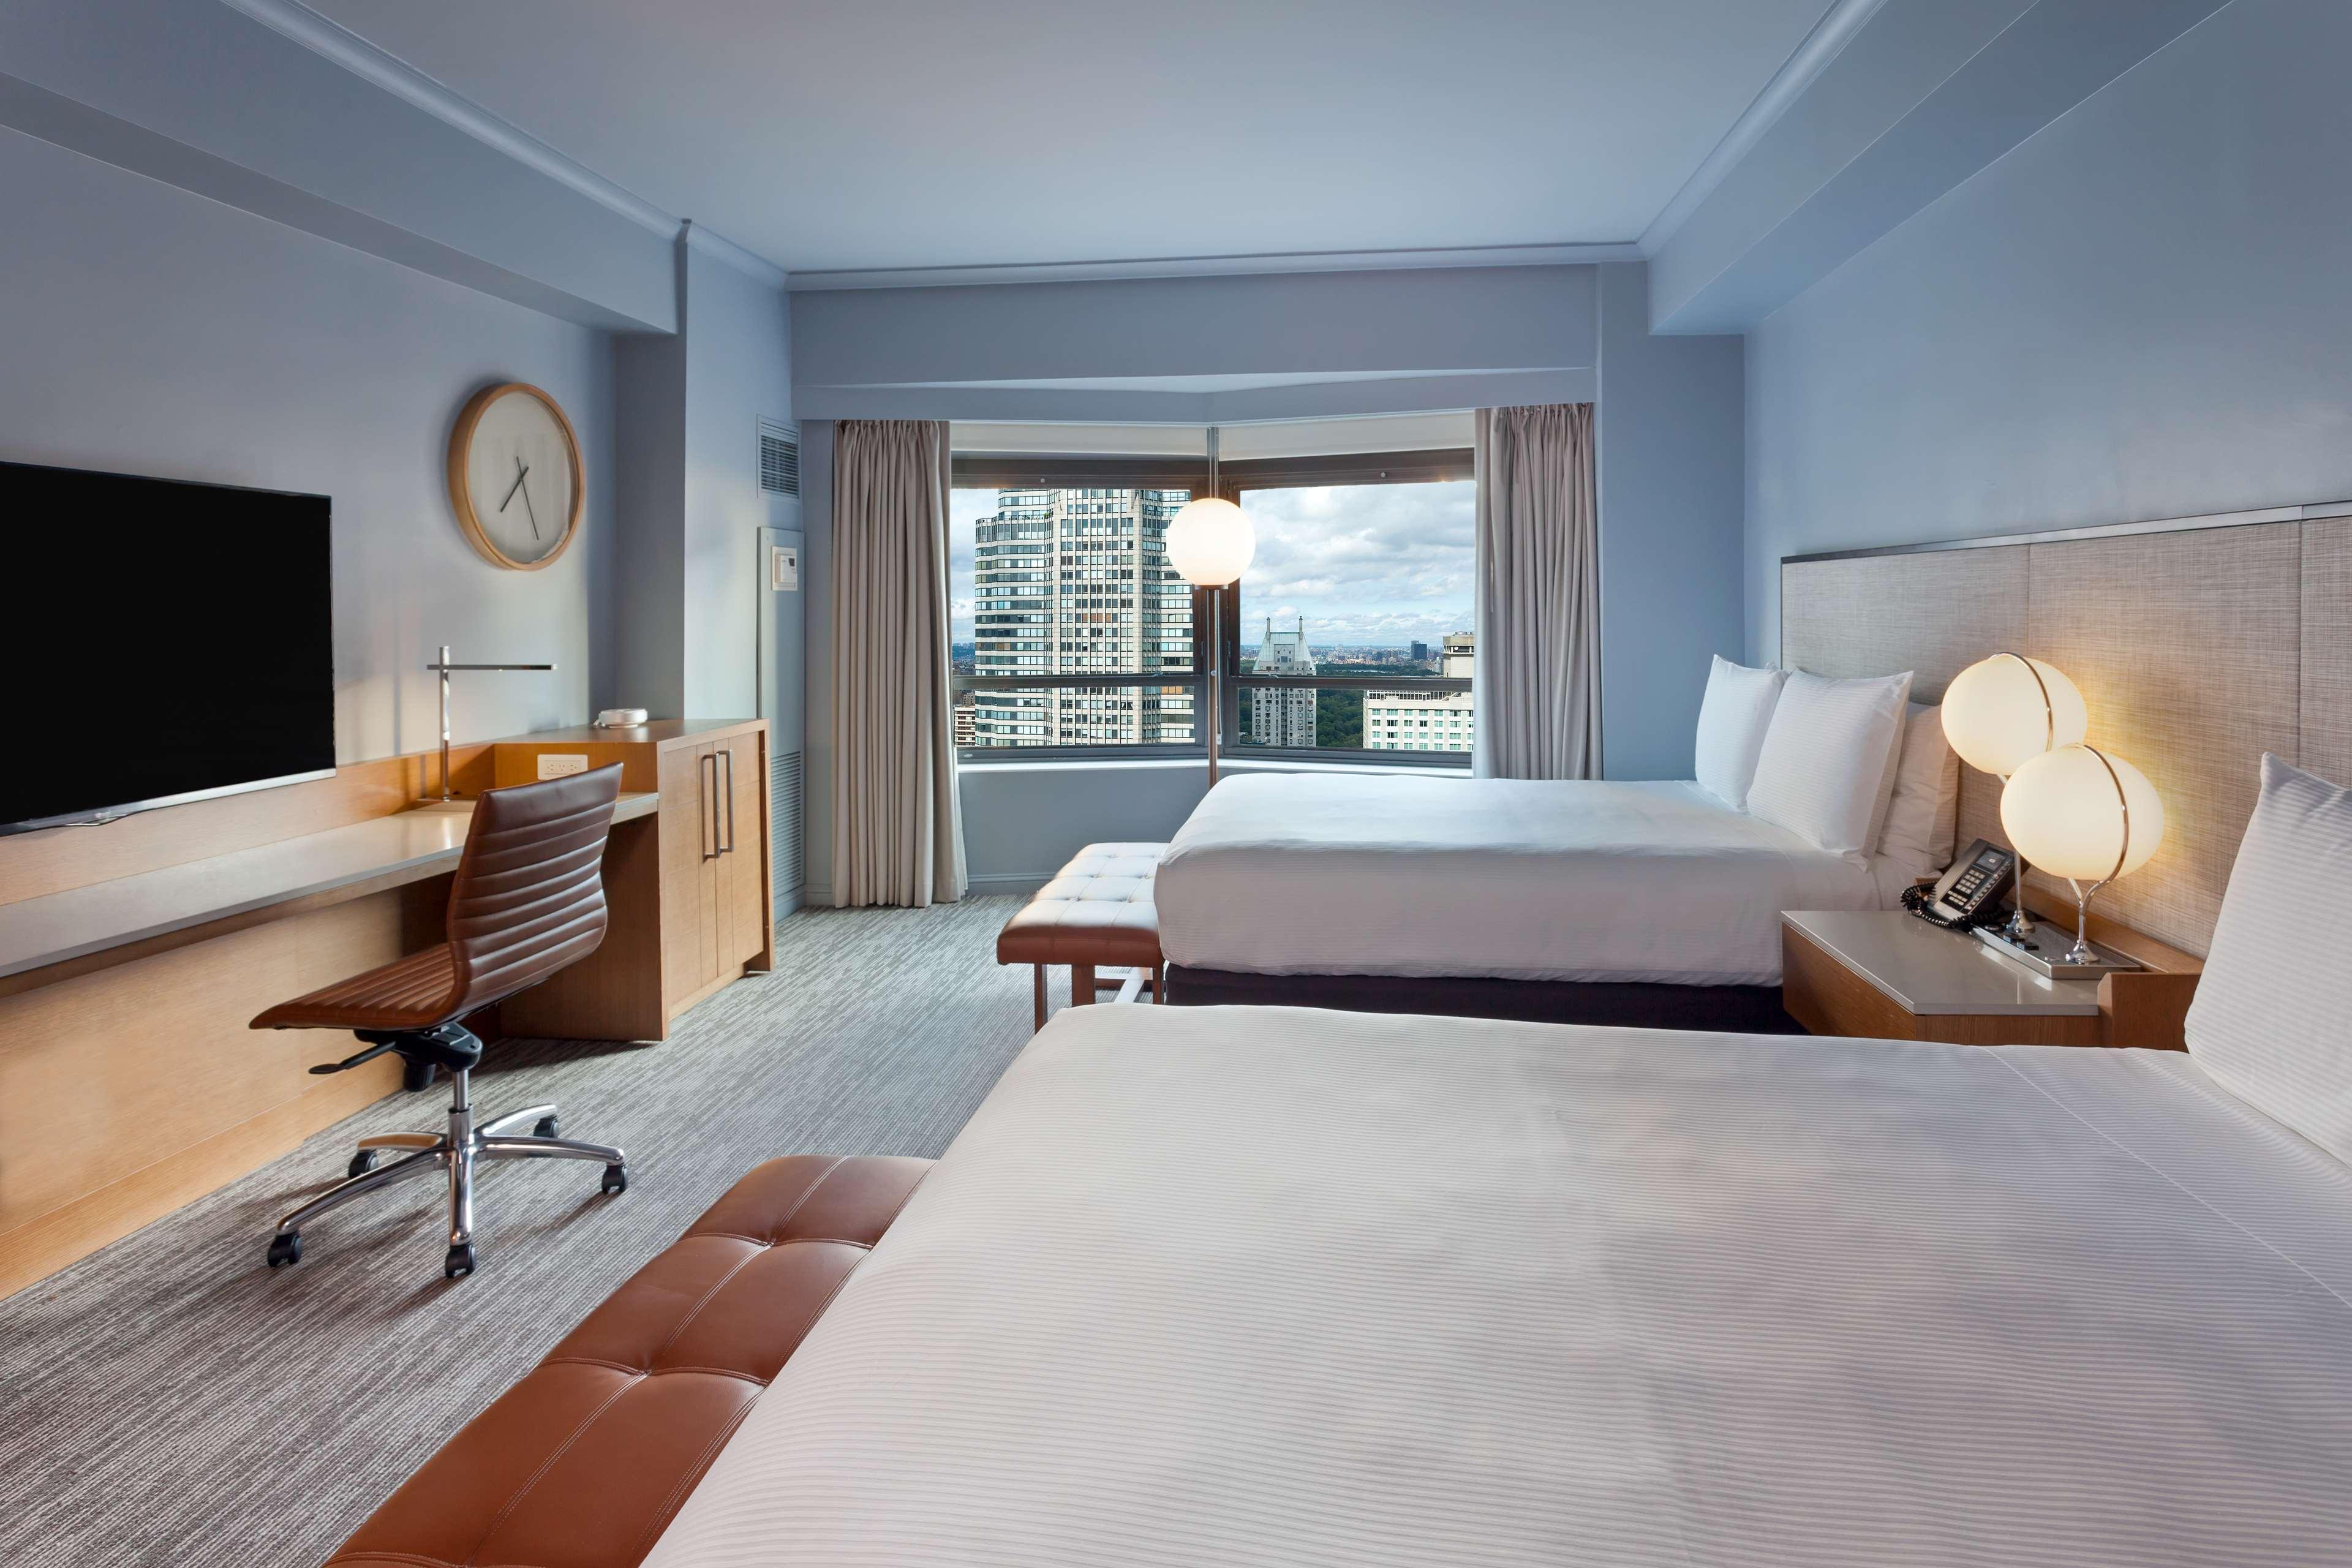 New York Hilton Midtown image 49